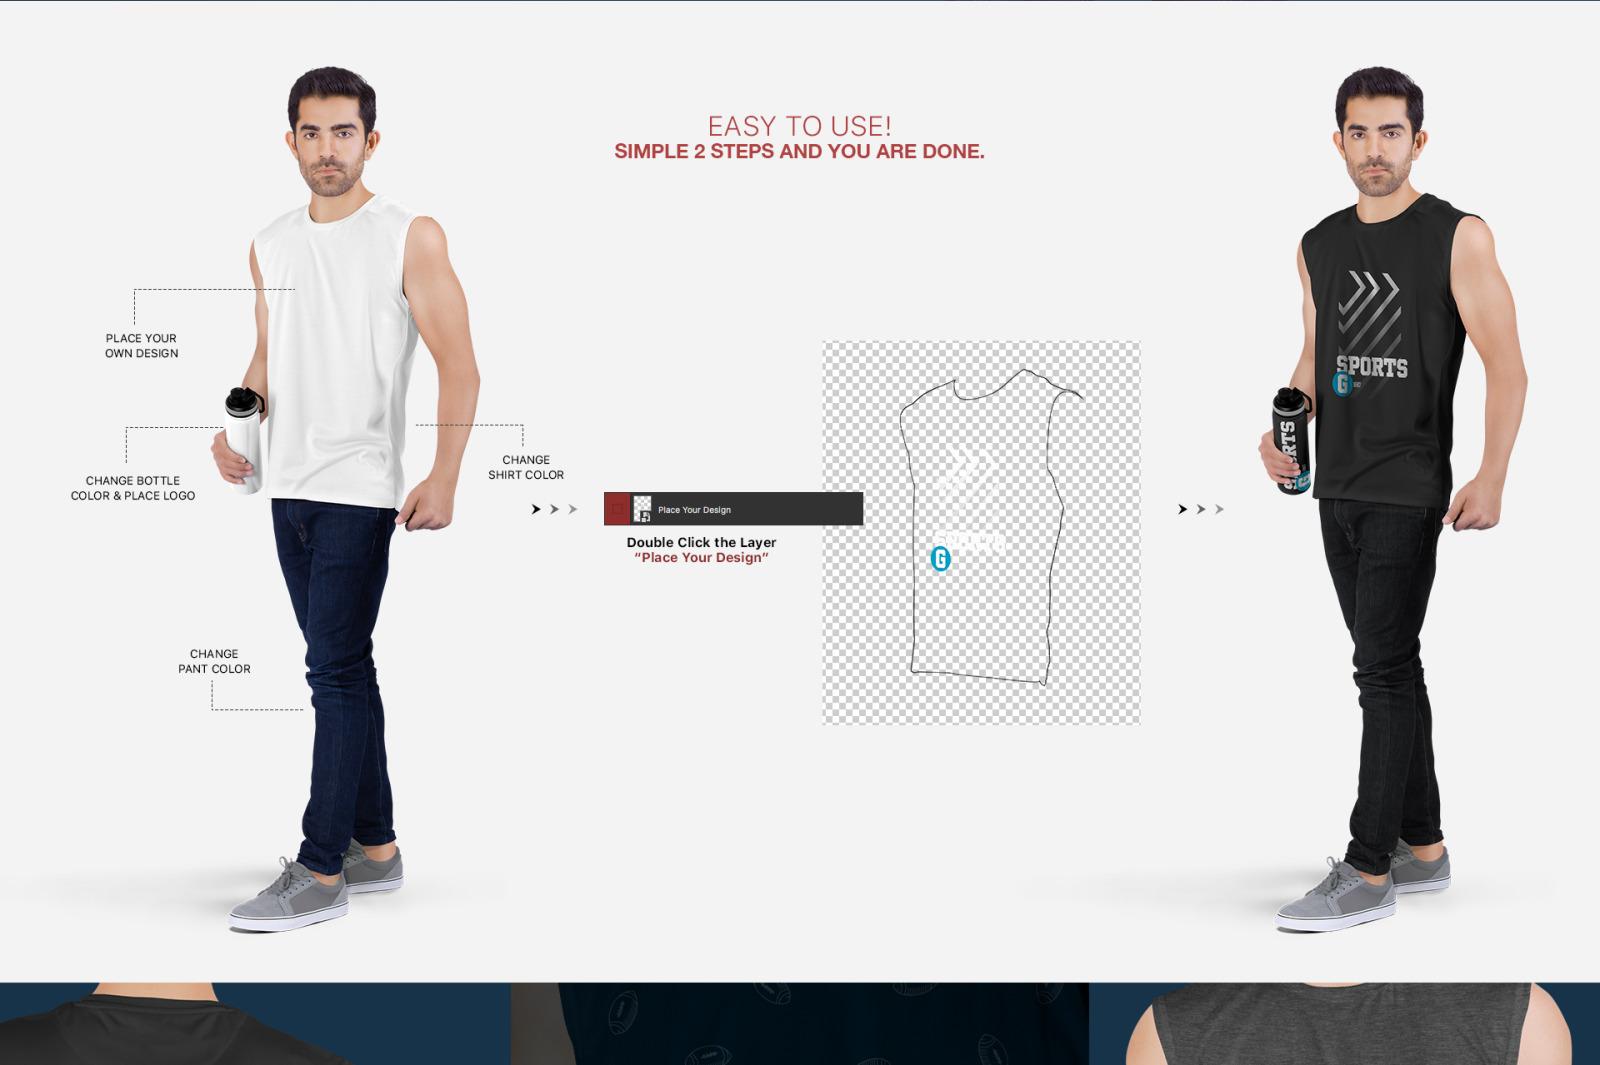 Men's Sleeveless Shirt Mockup Set